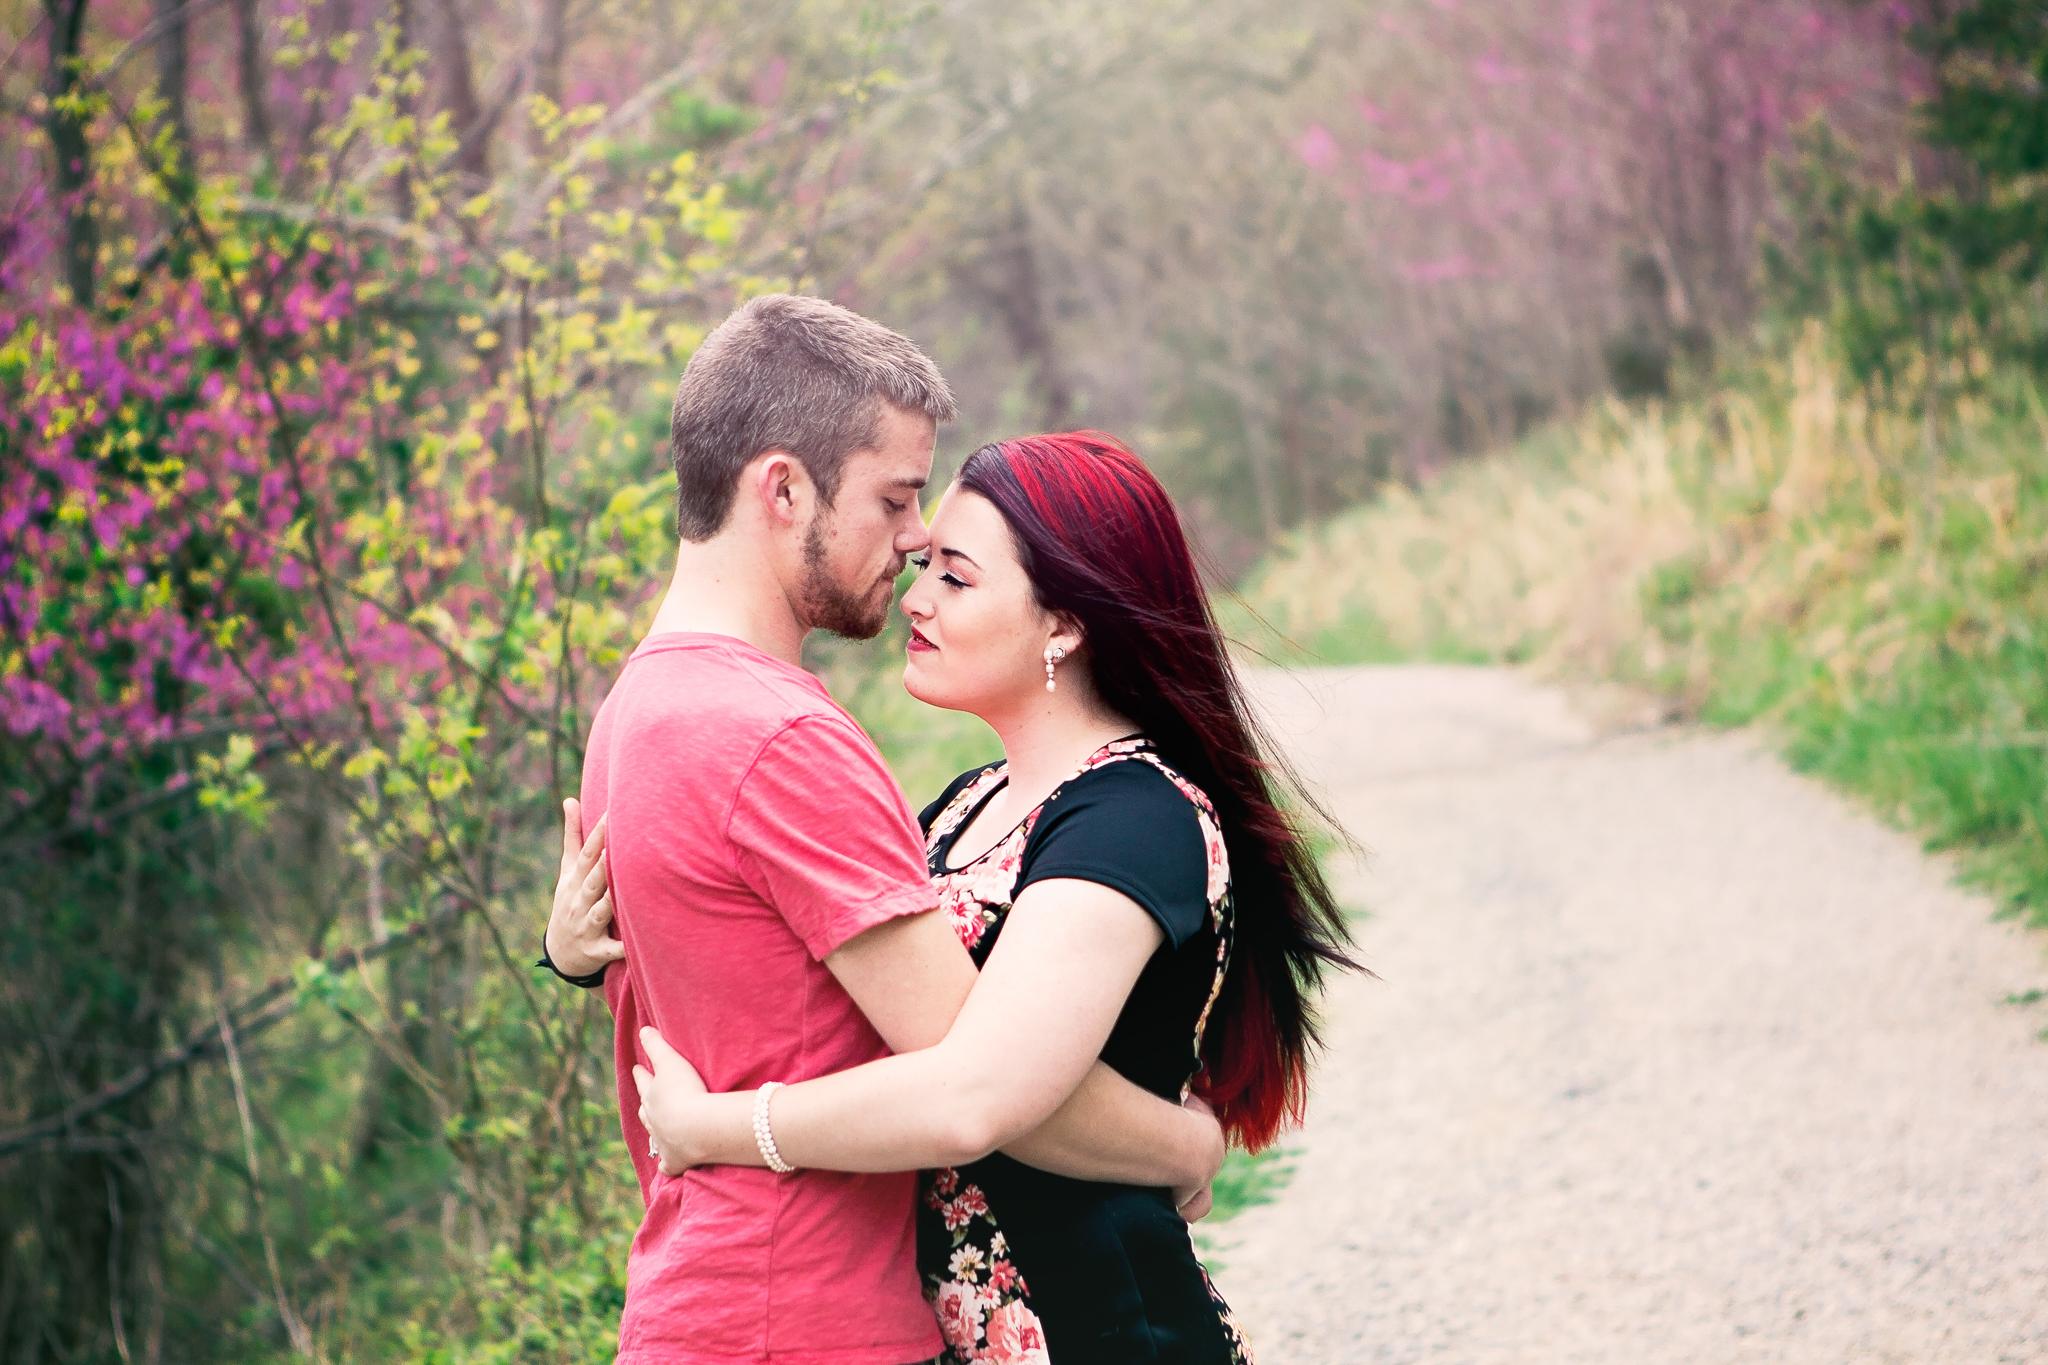 Richmond Kentucky Engagement Photographer - Ariana Jordan Photography -1.jpg